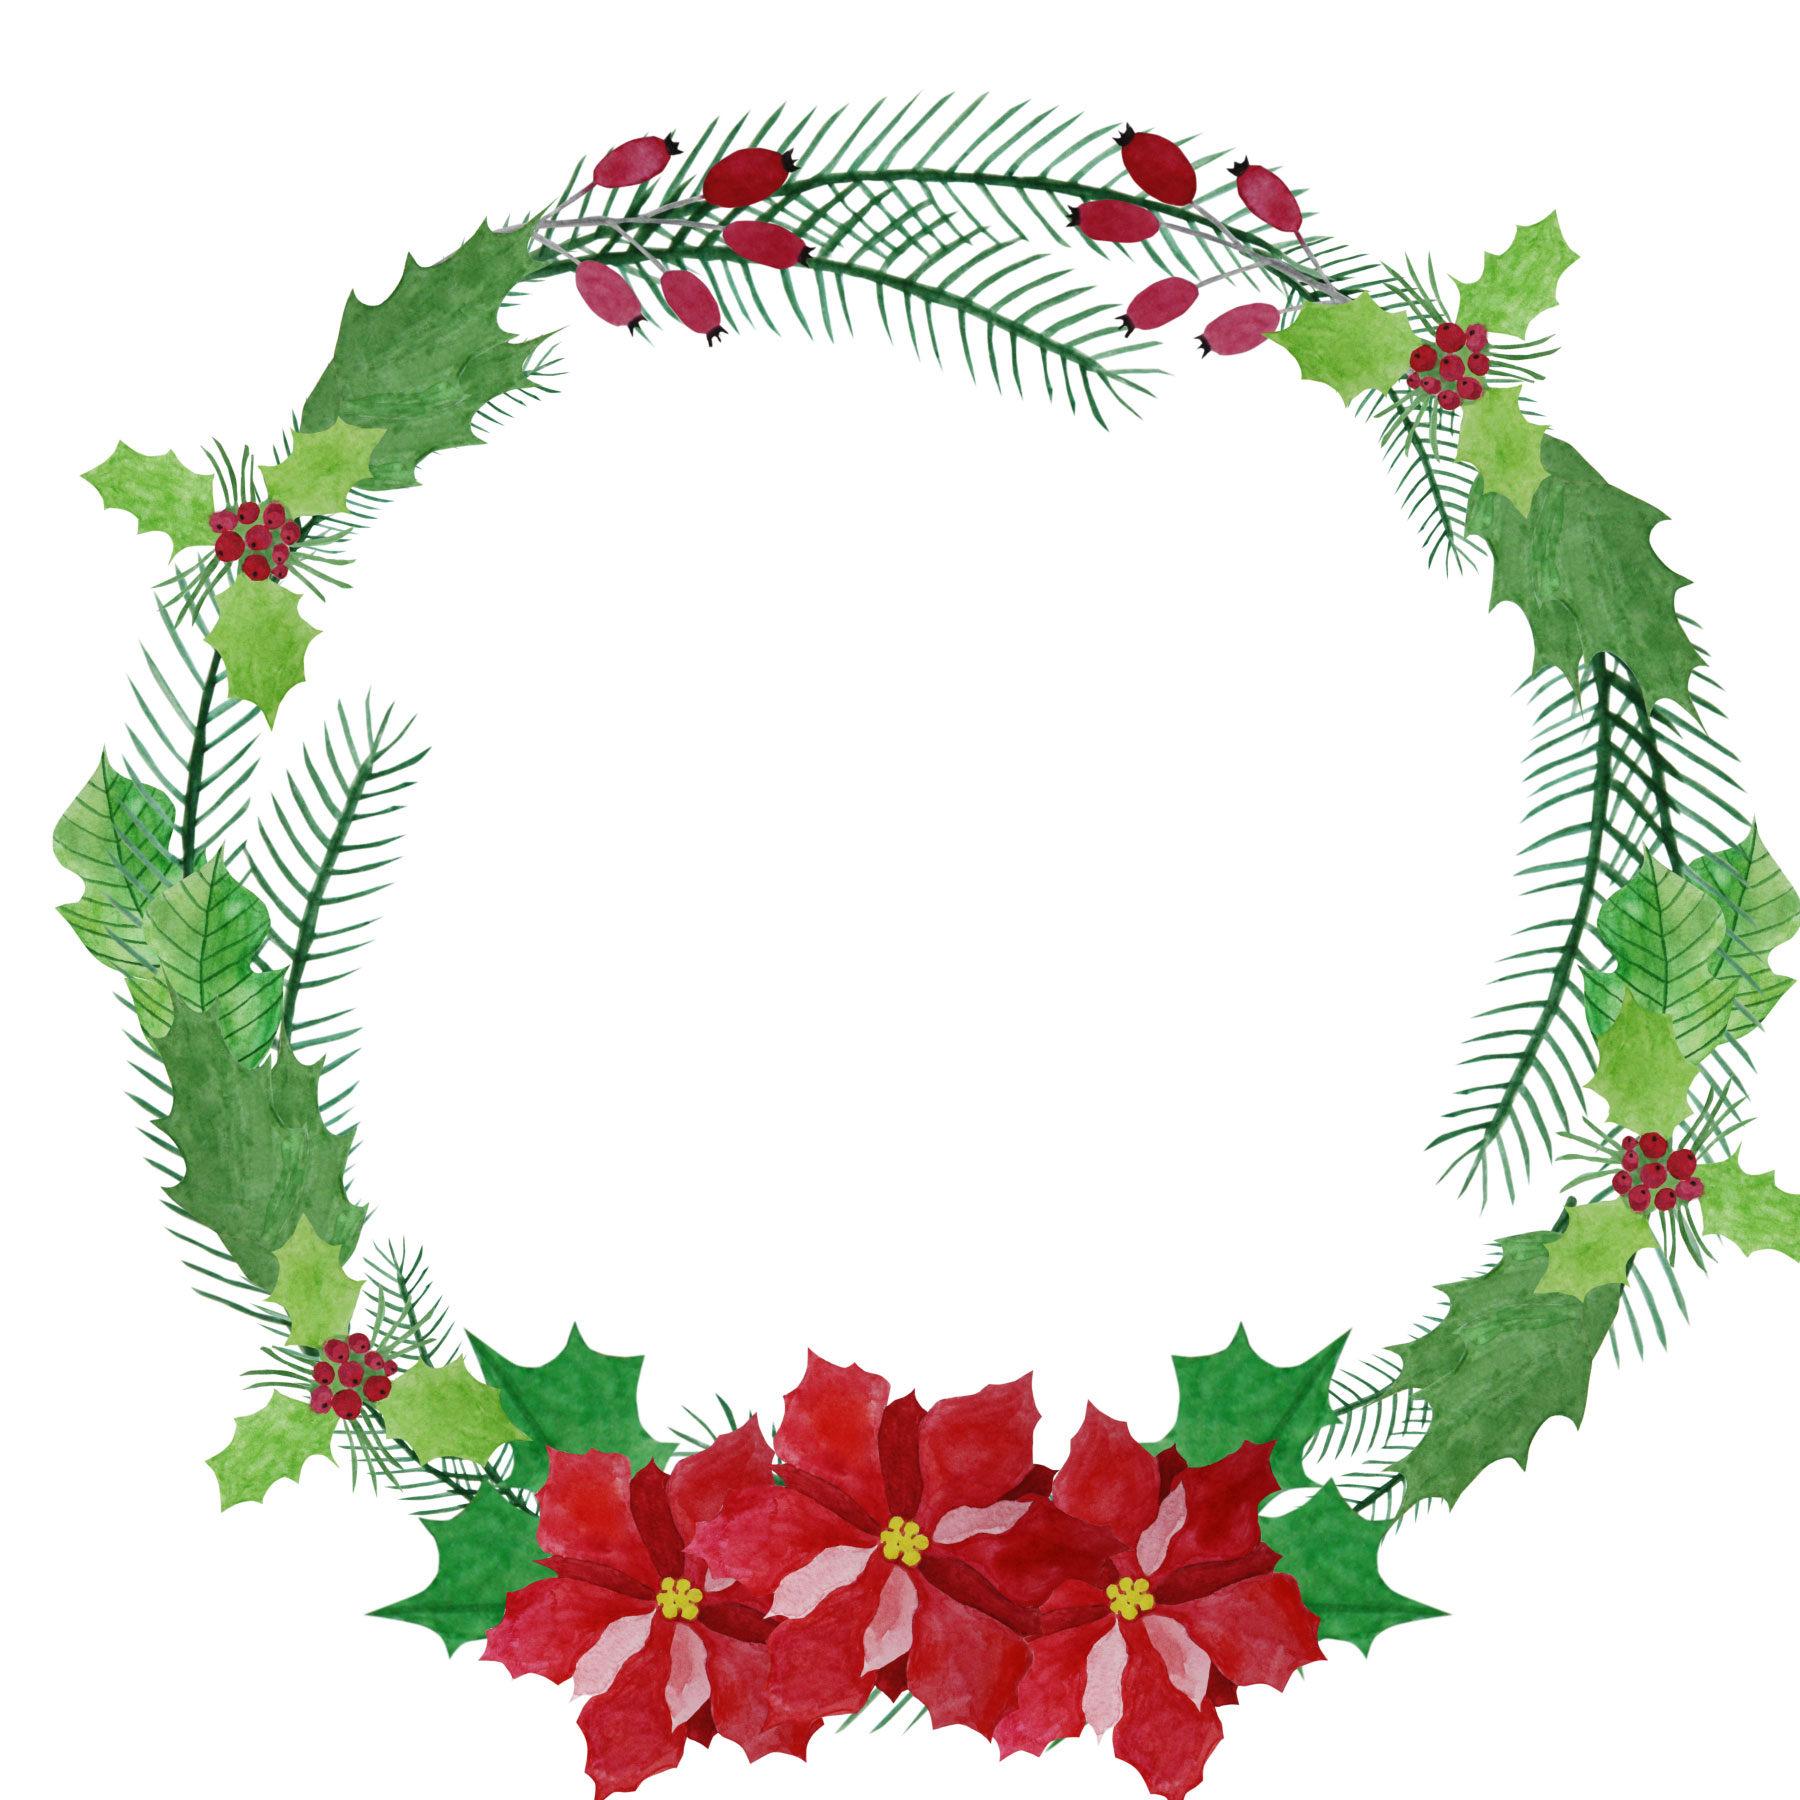 1800x1800 Watercolor Wreath Clipart, Poinsettia Wreath, Christmas Wreath